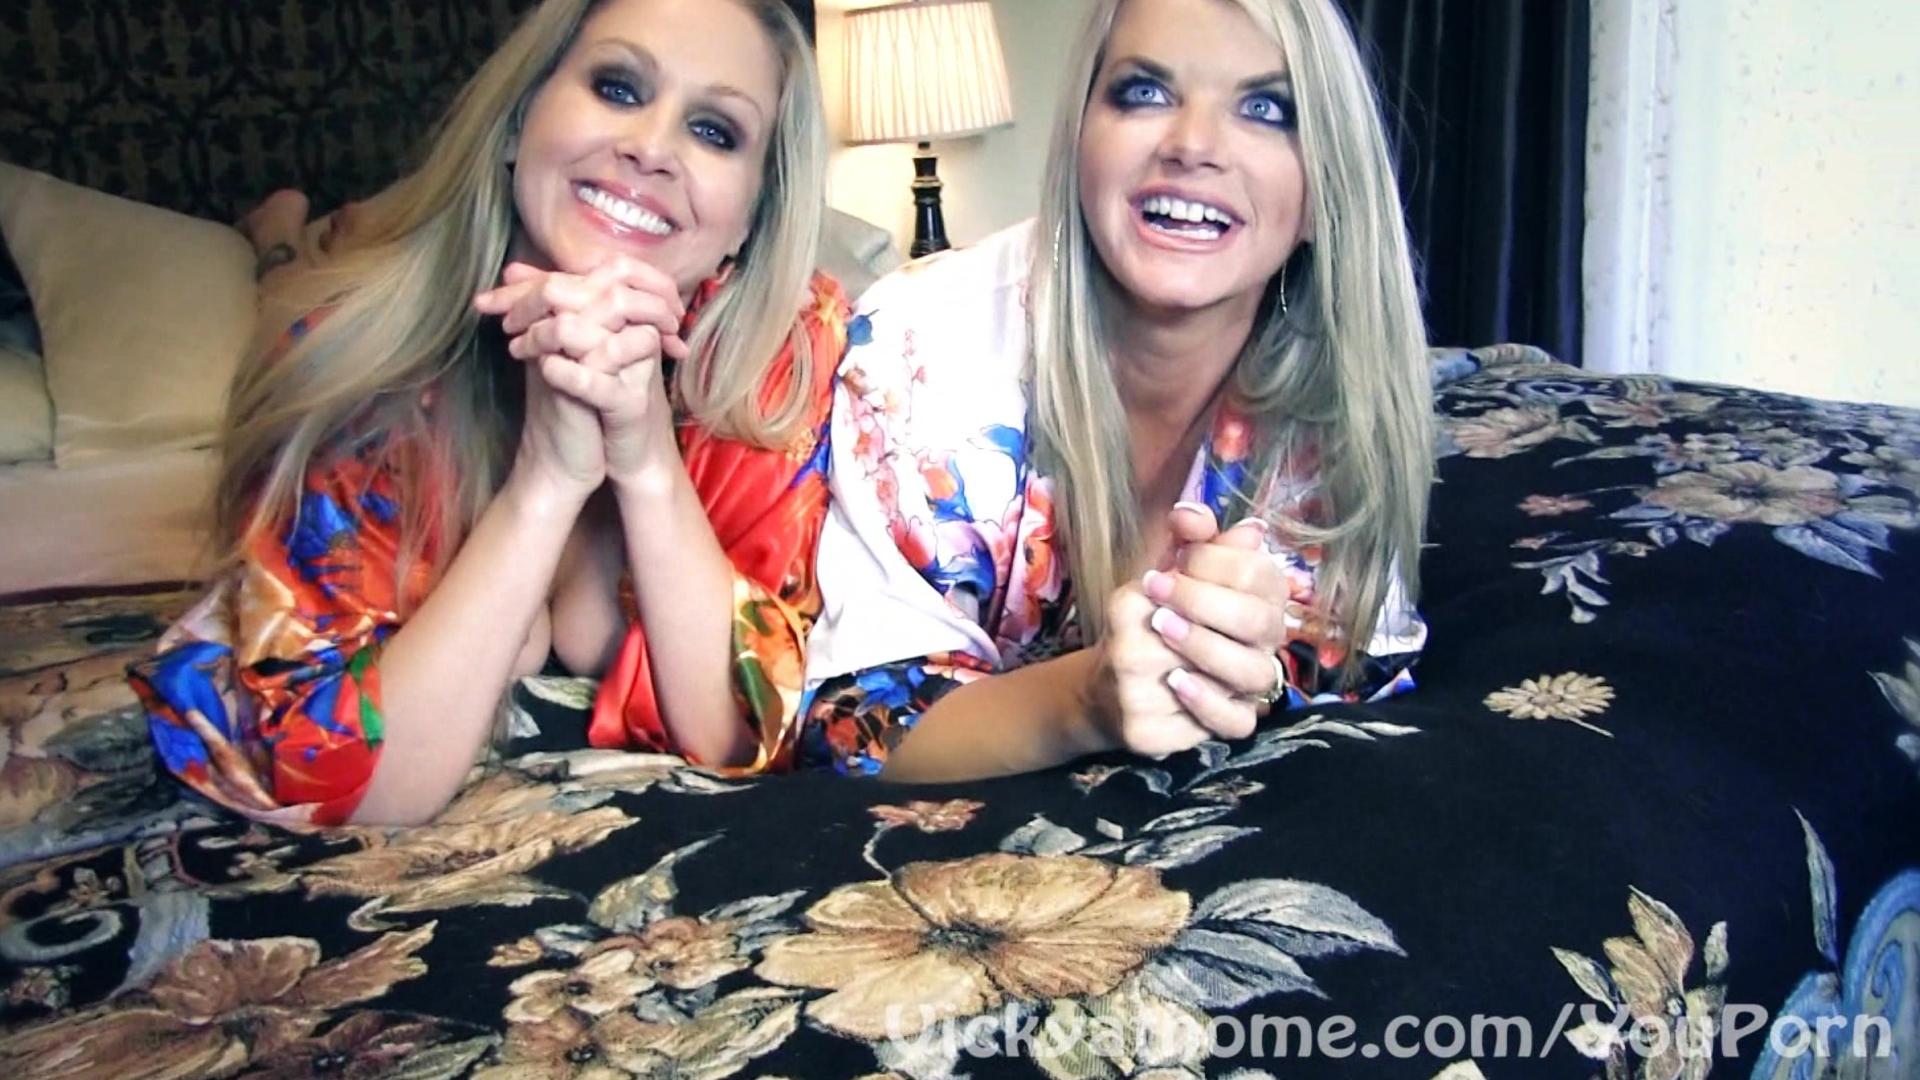 Superstar MILFS Vicky Vette & Julia Anns First EVER Video?!